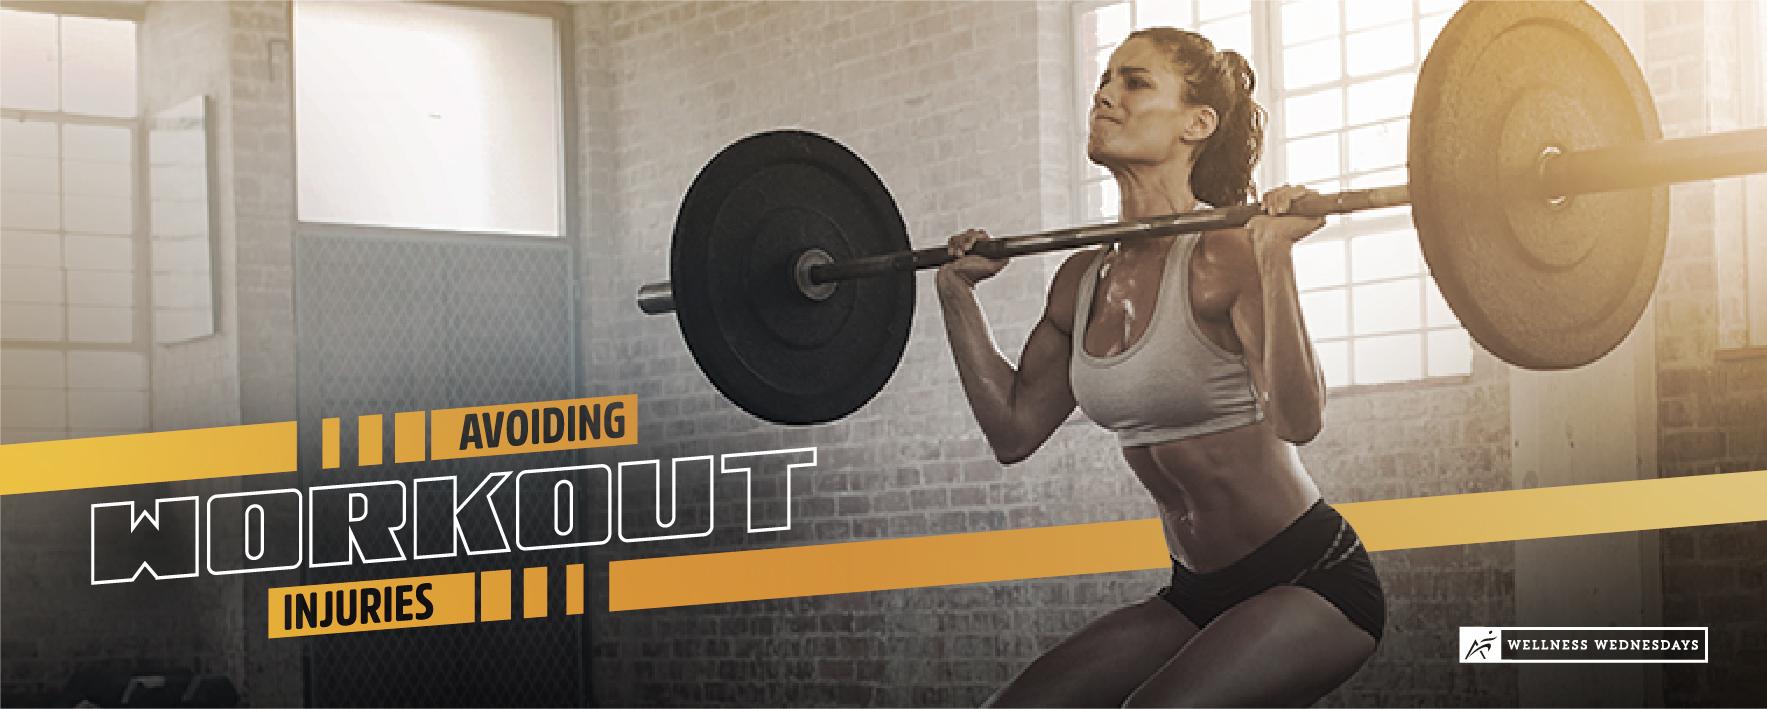 Avoiding Workout Injuries